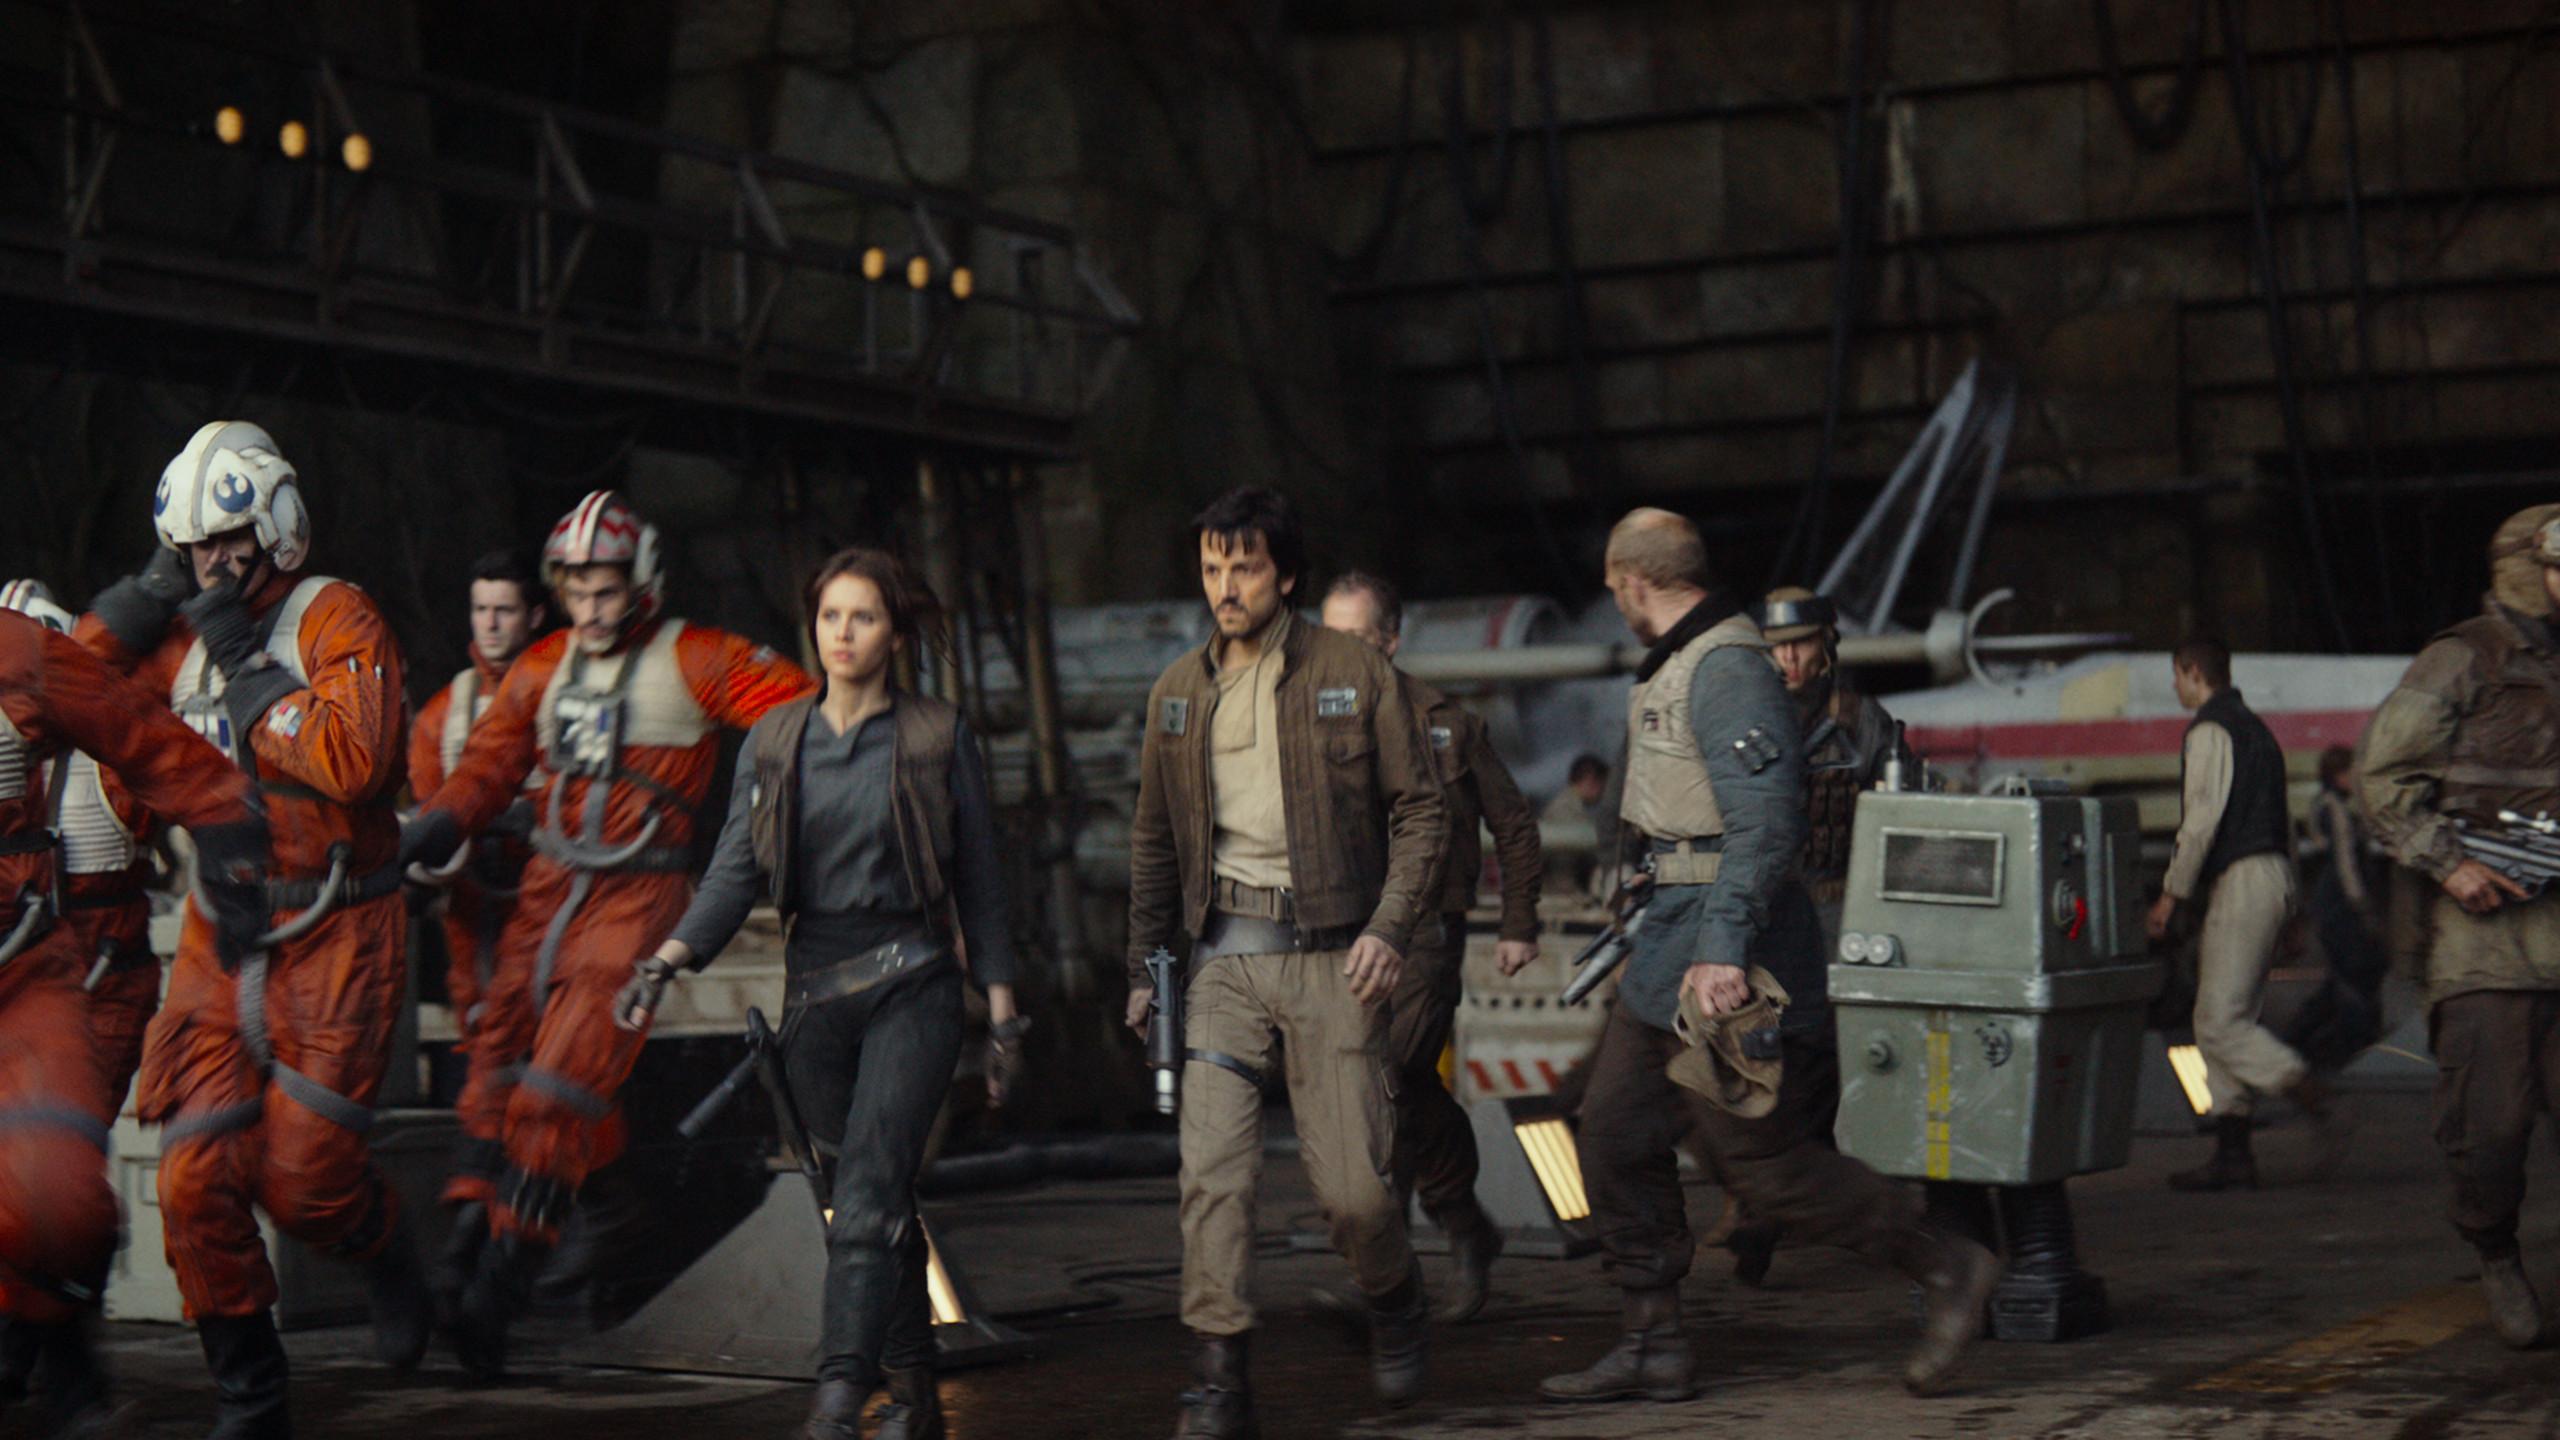 Felicity Jones and Diego Luna march into battle.